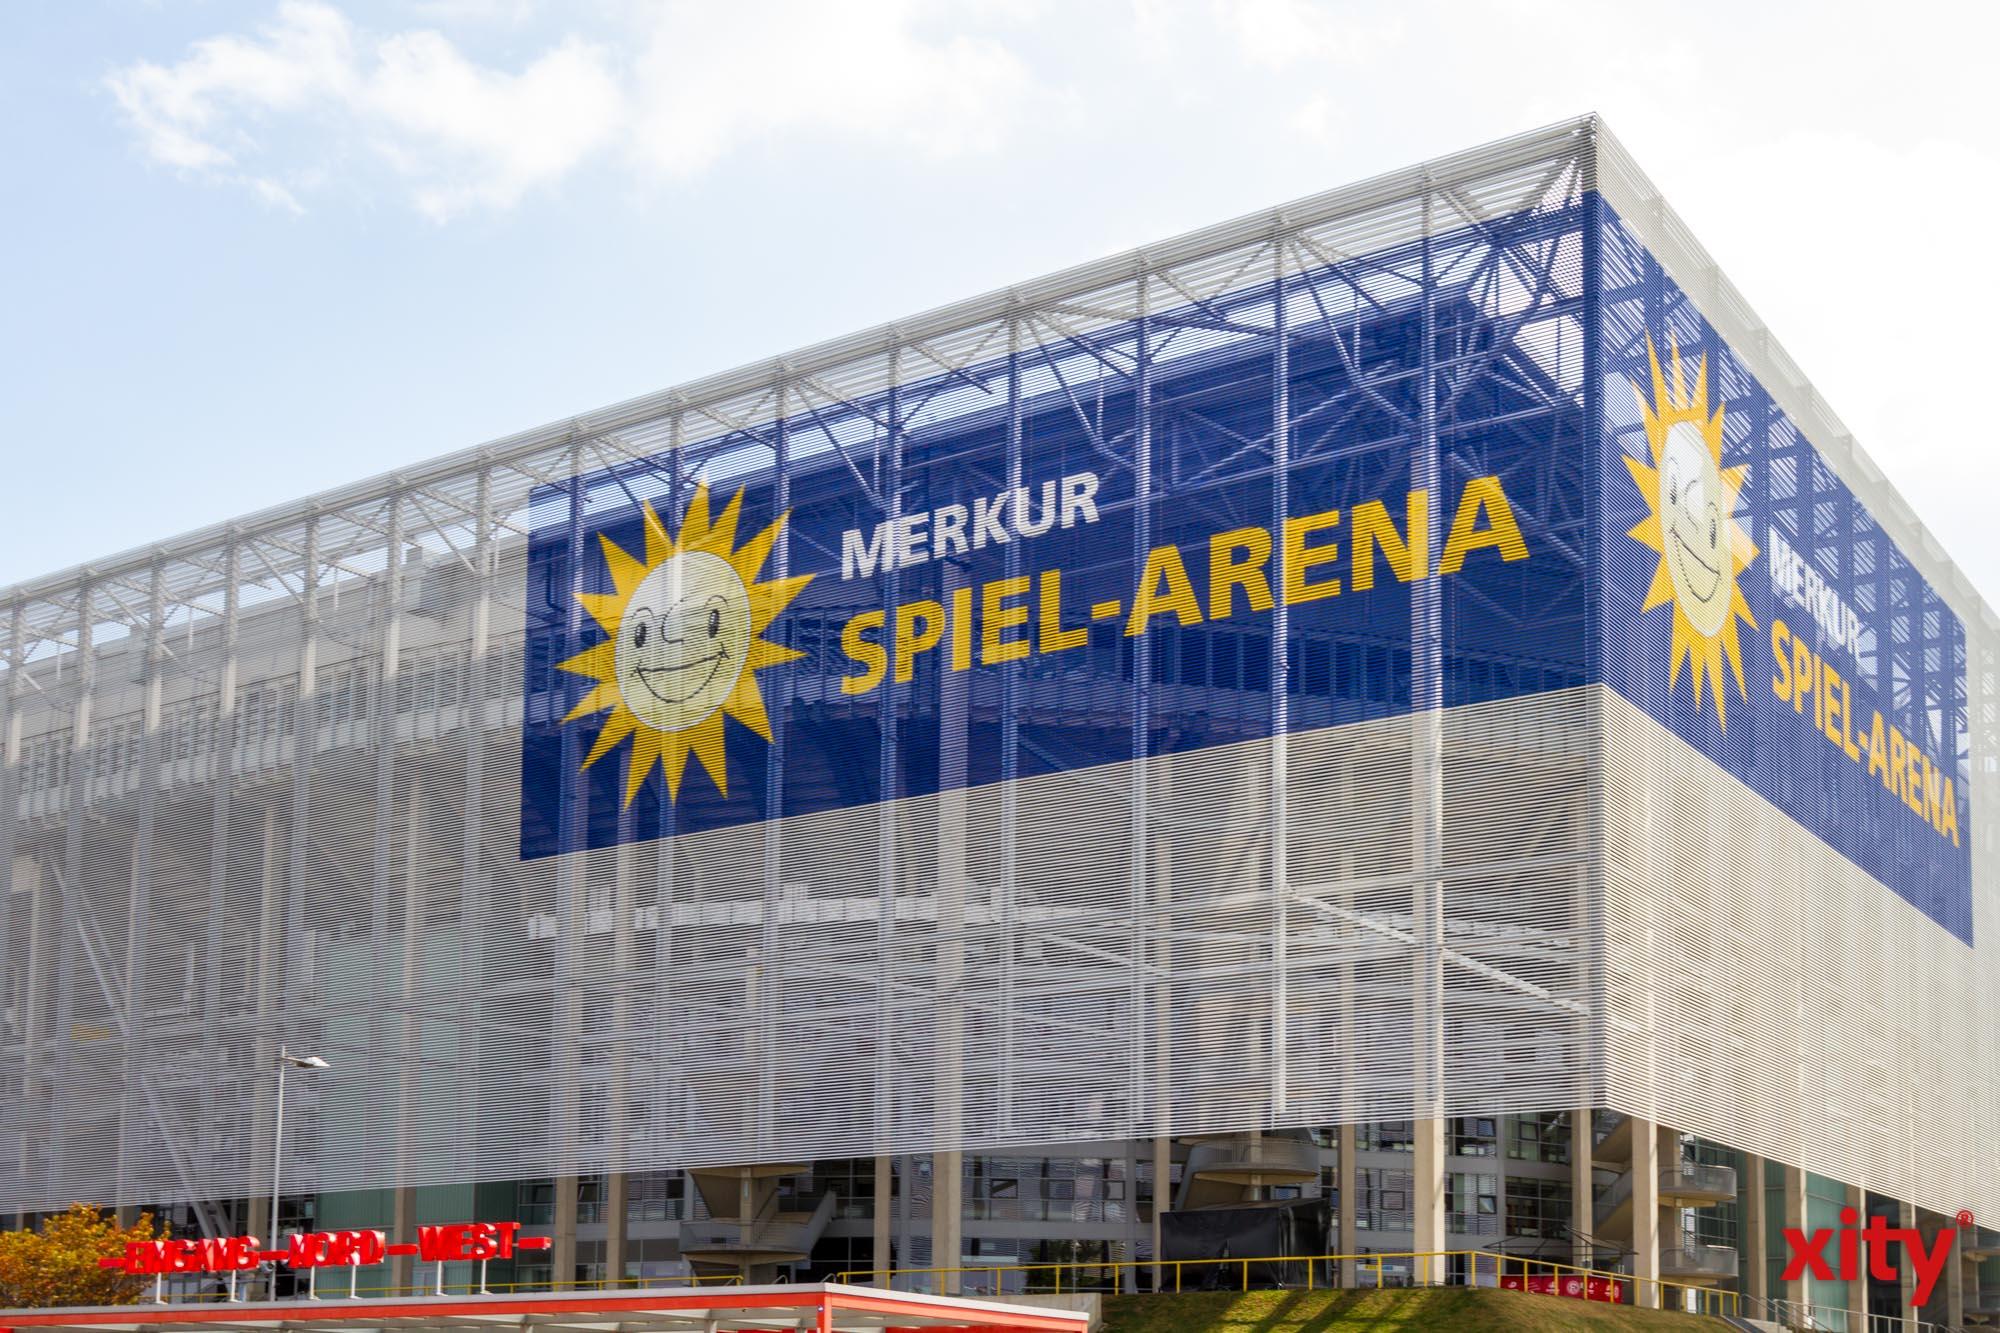 Finalturnier der UEFA Europa League 2020